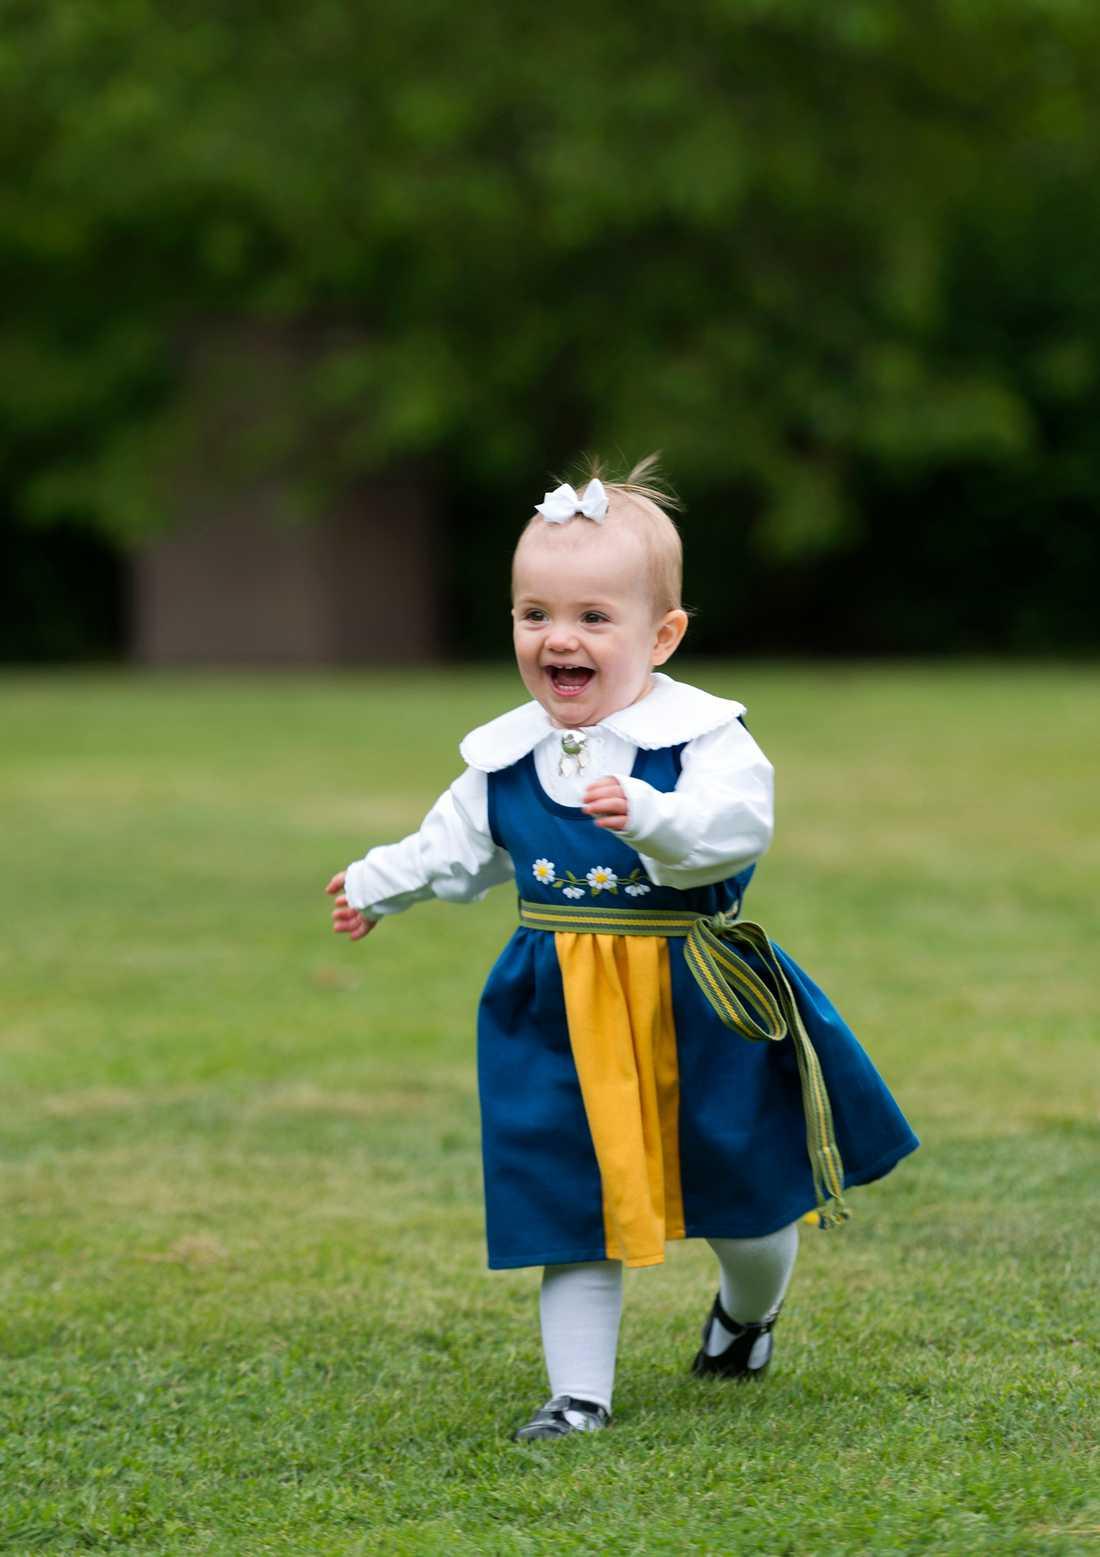 Prinsessan Estelle 2013.